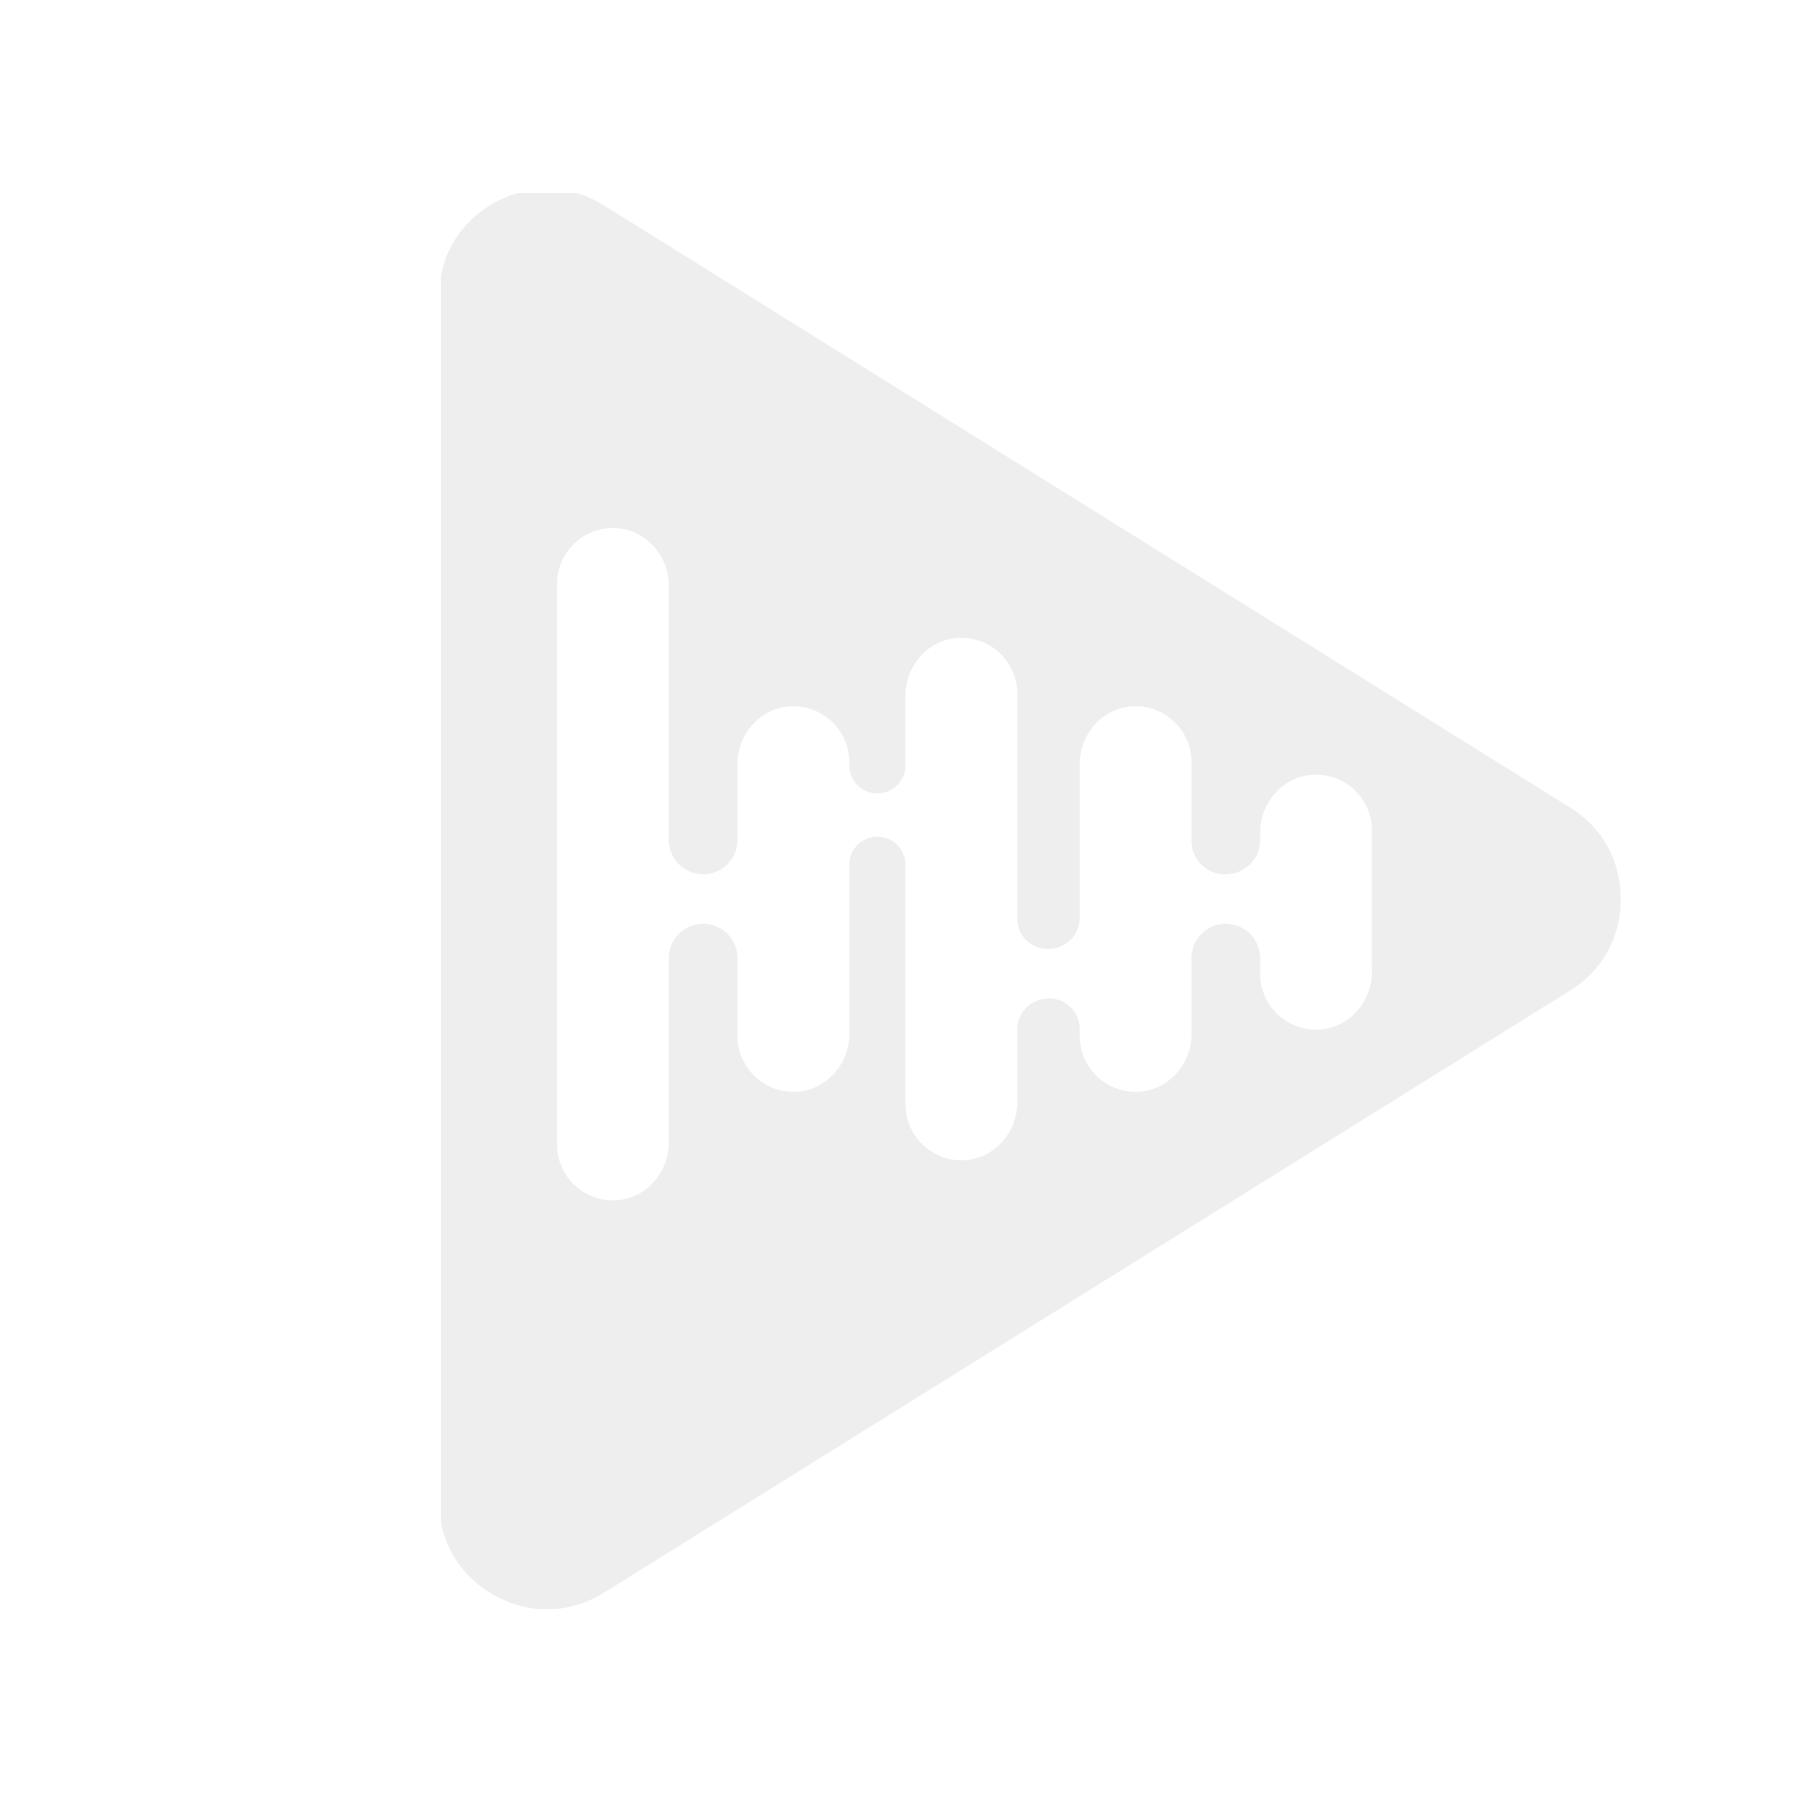 Speedsignal B-3444756